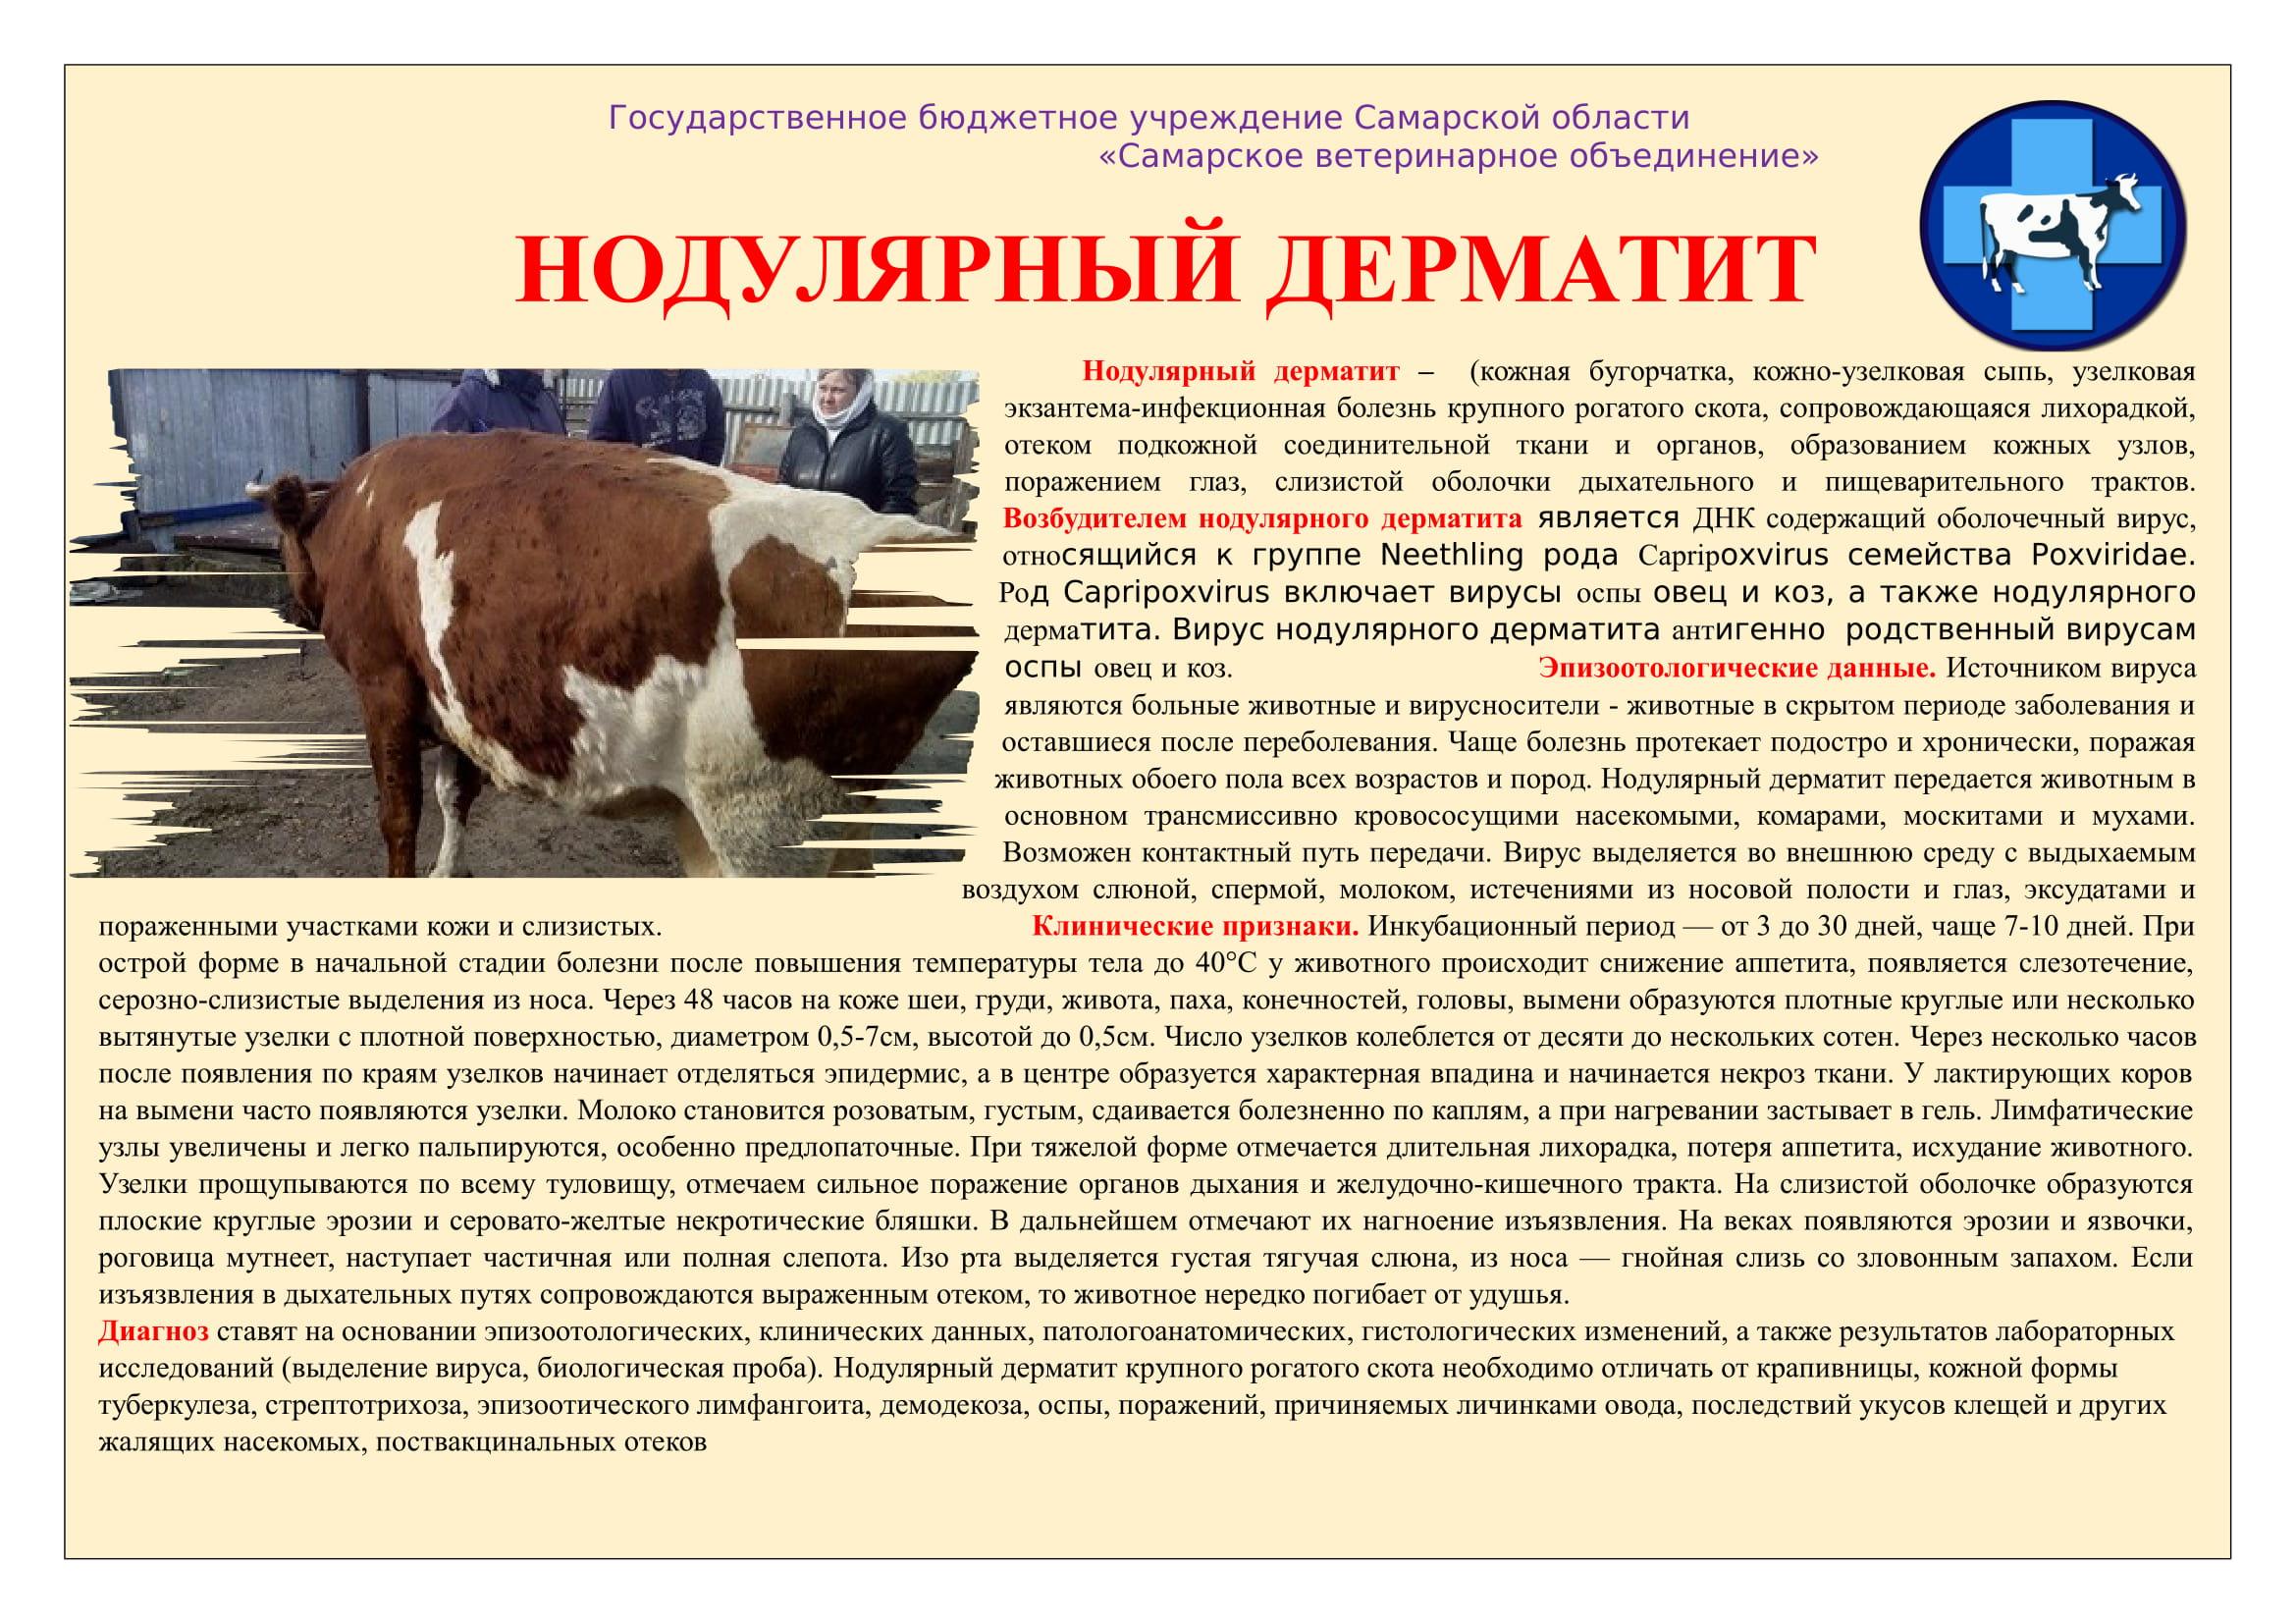 Инструкция по нодулярному дерматиту крупного рогатого скота